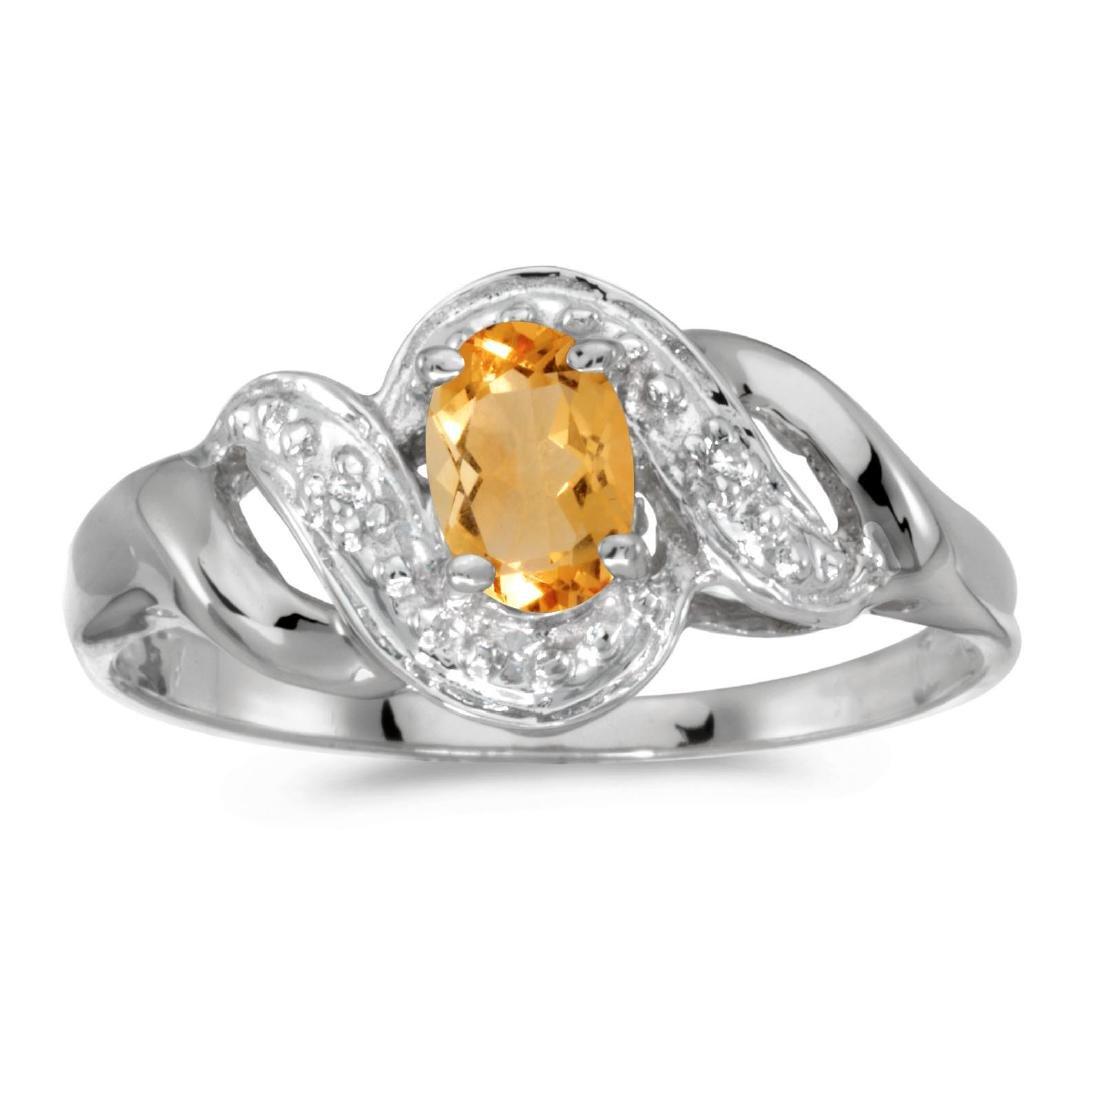 Certified 14k White Gold Oval Citrine And Diamond Swirl